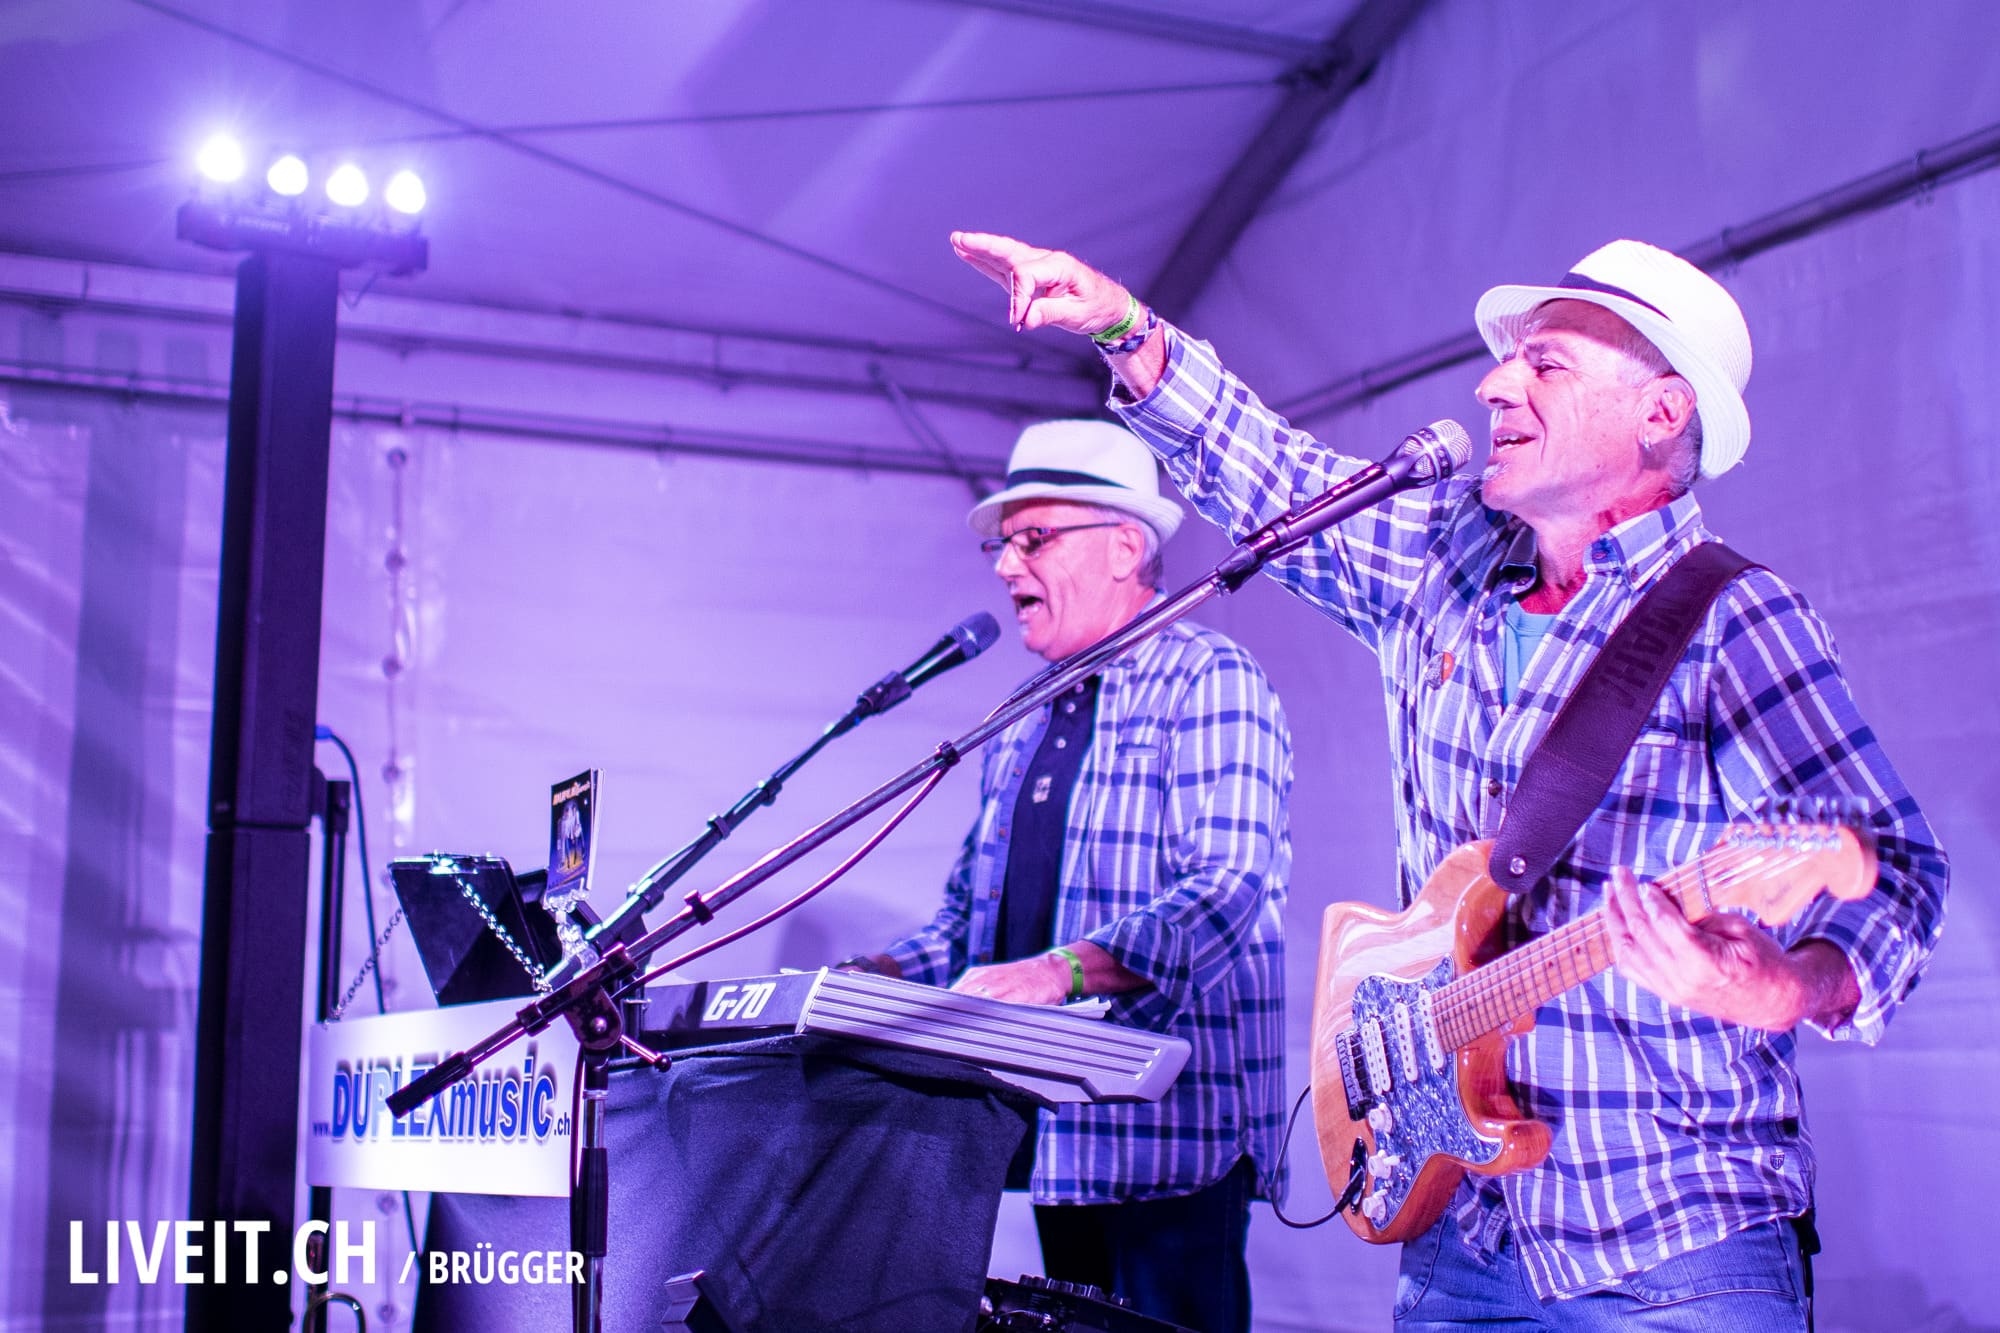 Duplex Music Thunfest 2018 in Thun. (Dominic Bruegger for liveit.ch)